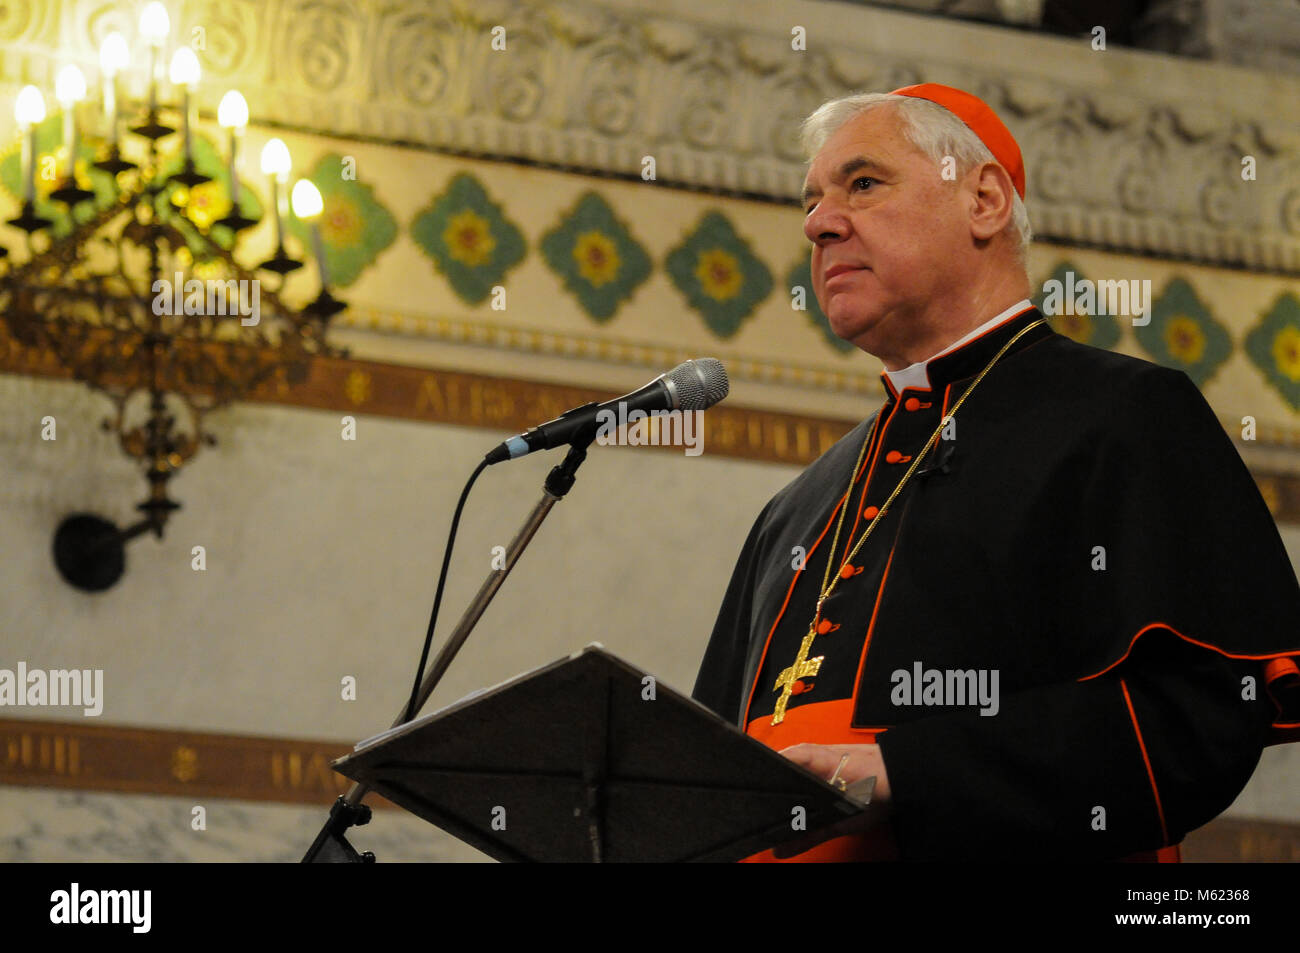 German Cardinal Gerhard Muller talks in Lyon, France - Stock Image